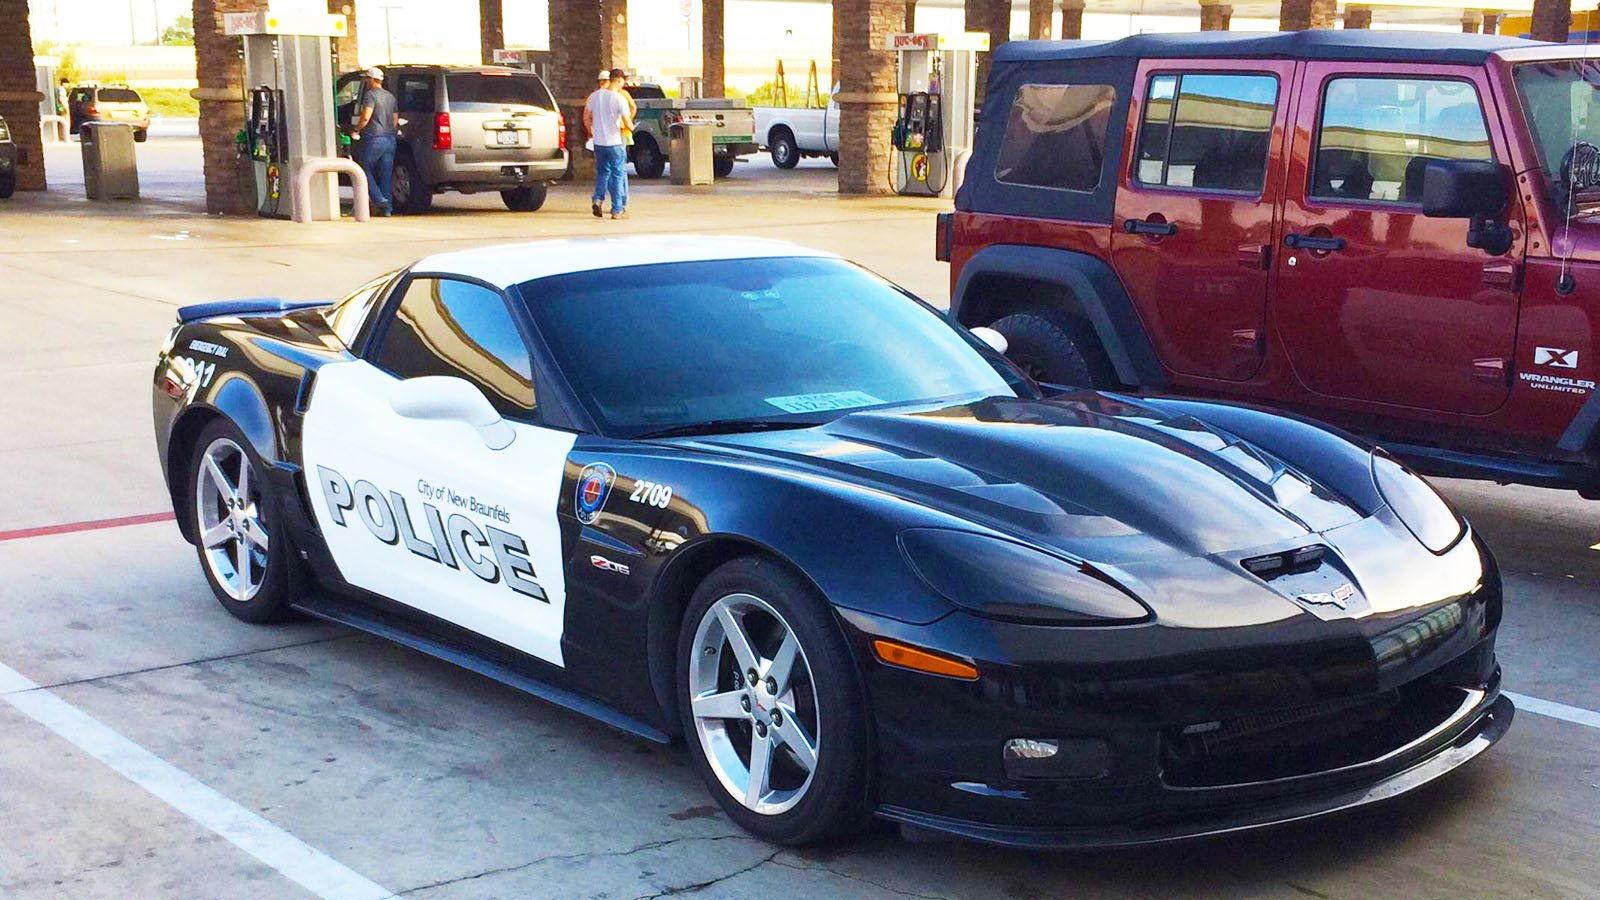 Corvette Police Car: Z06 4 Pics Of A Z06 Texas Police Car